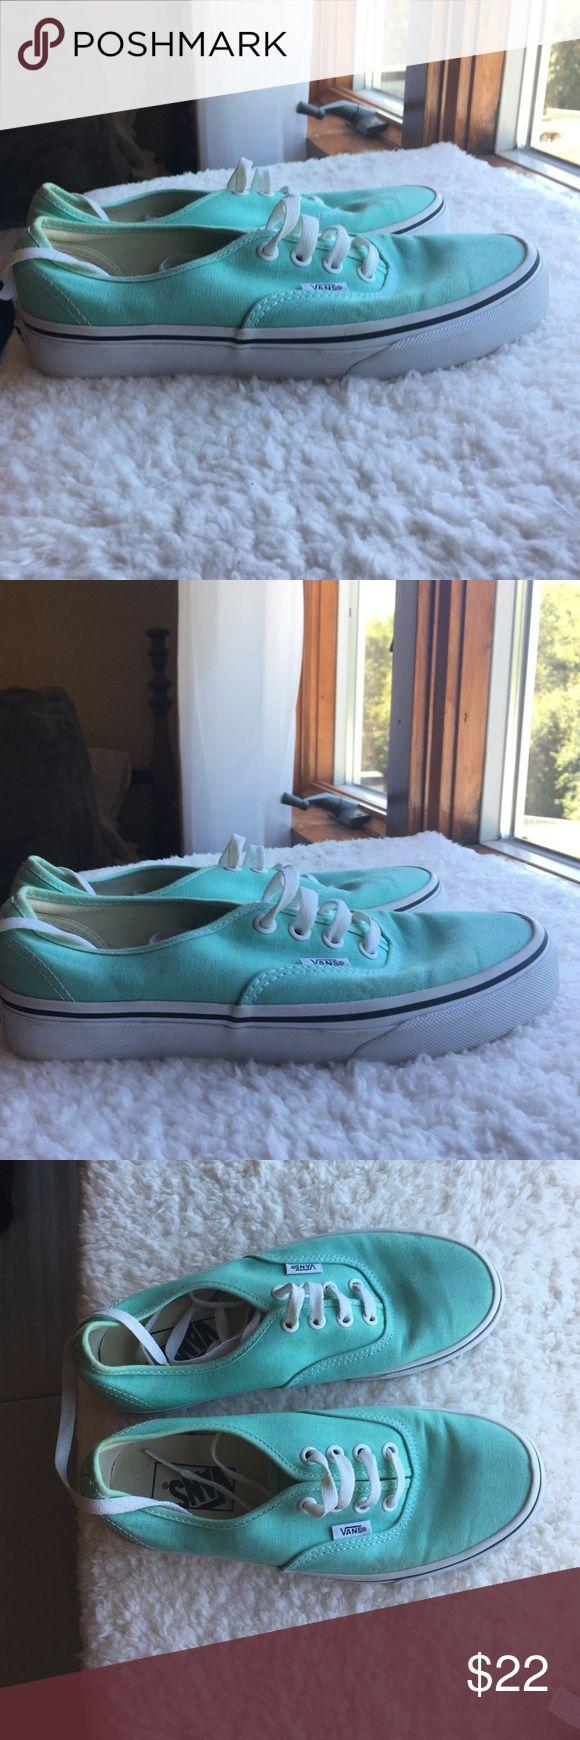 Mint vans Only worn a few times green blue vans Vans Shoes